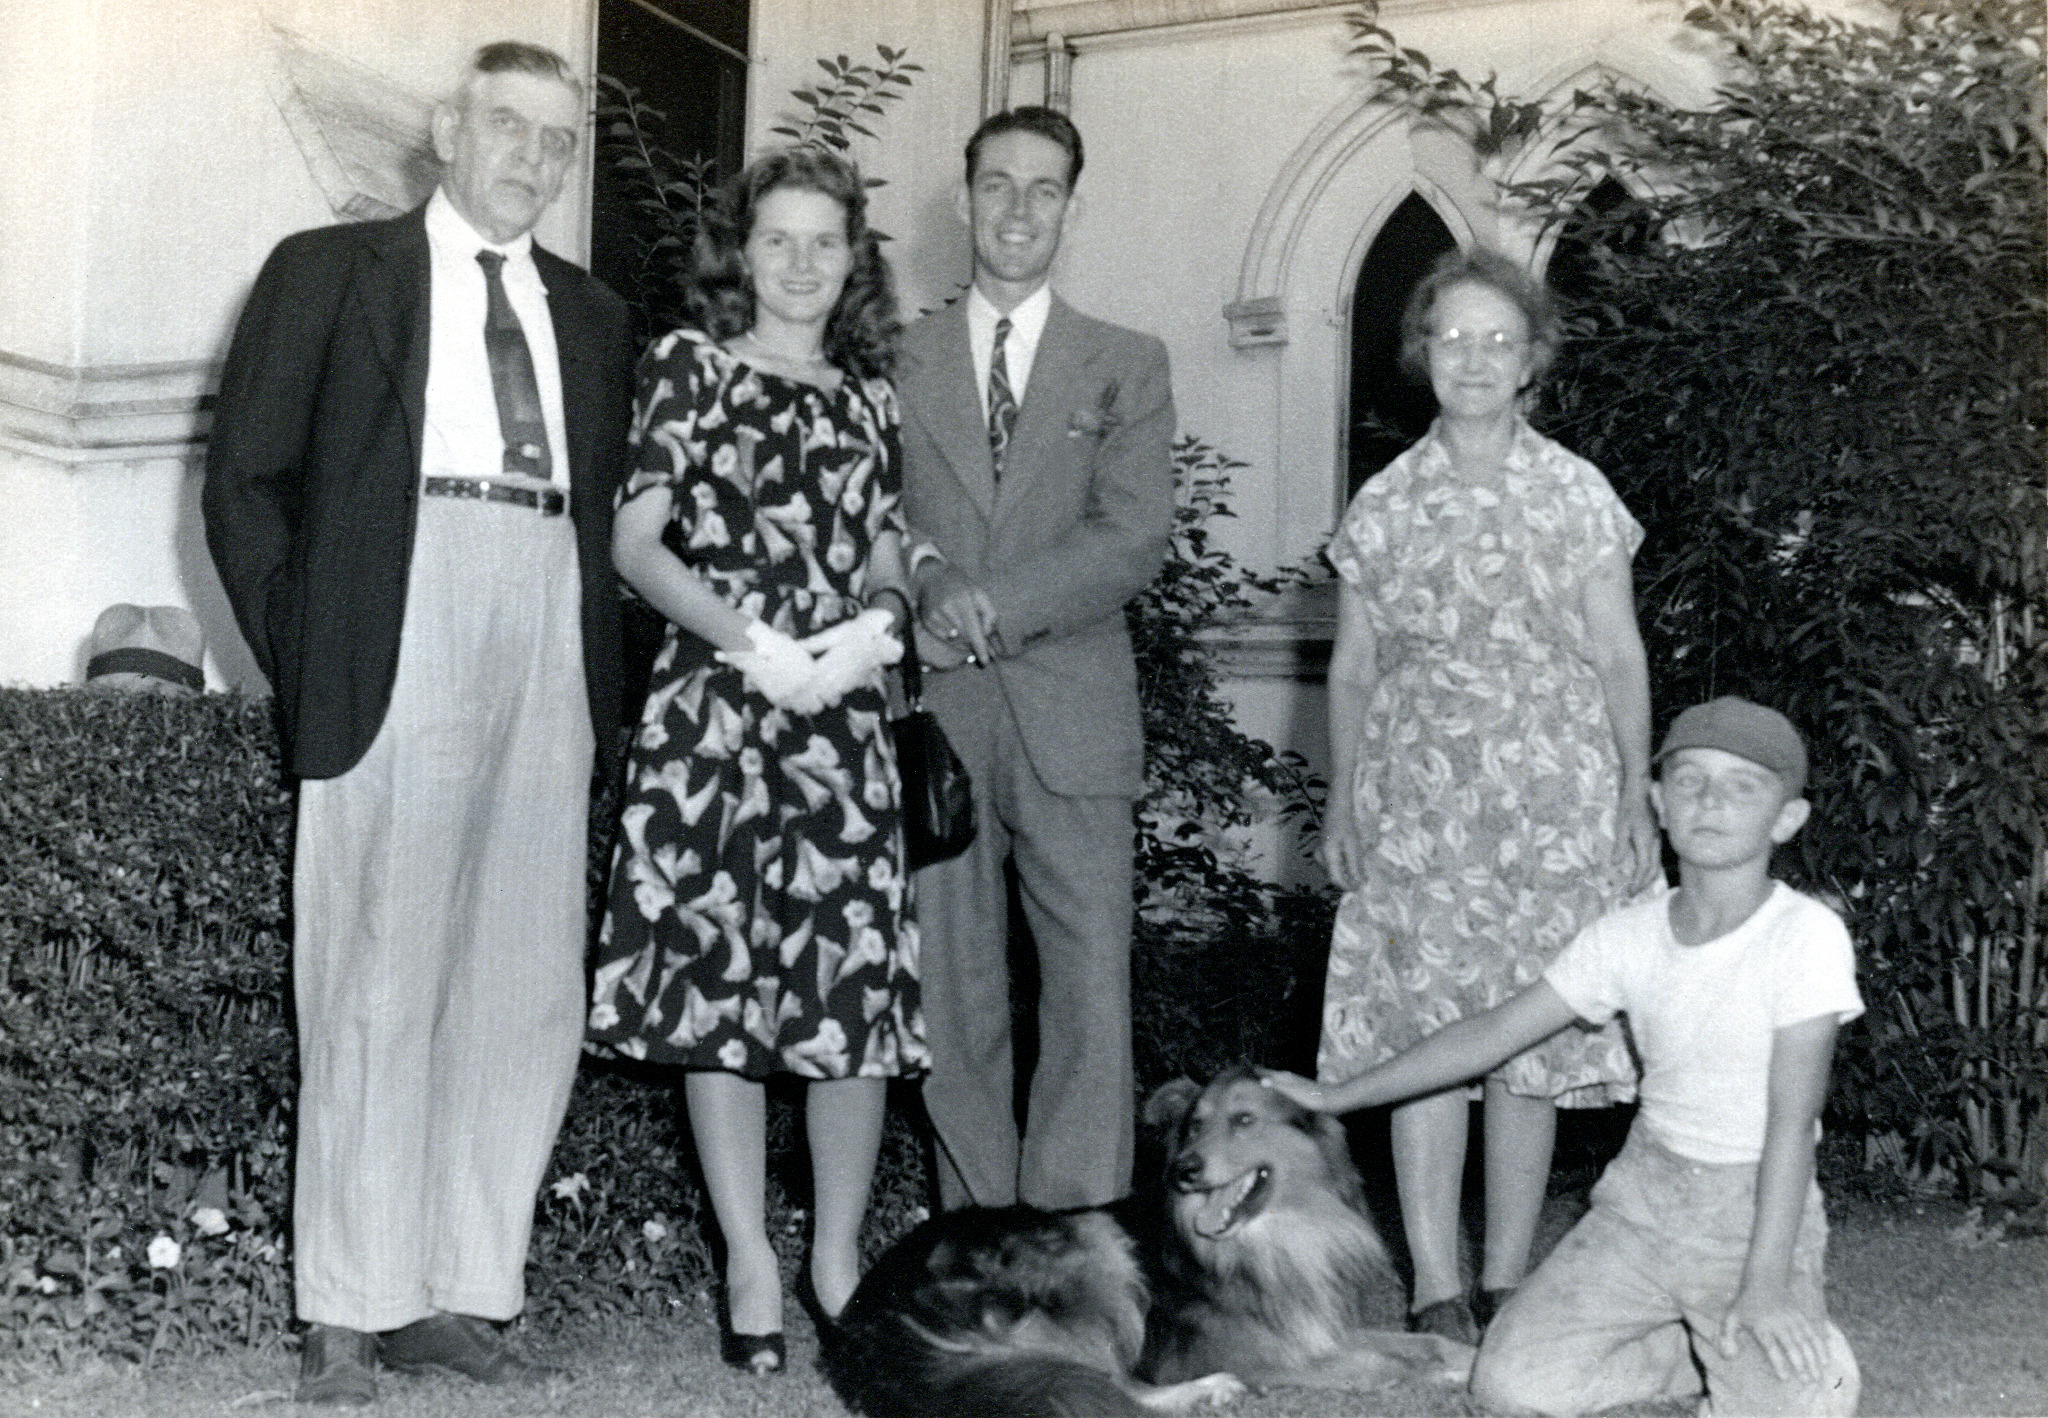 Isaac (Ike) Fletcher, Melba & Bob Phillips, Alice Fletcher